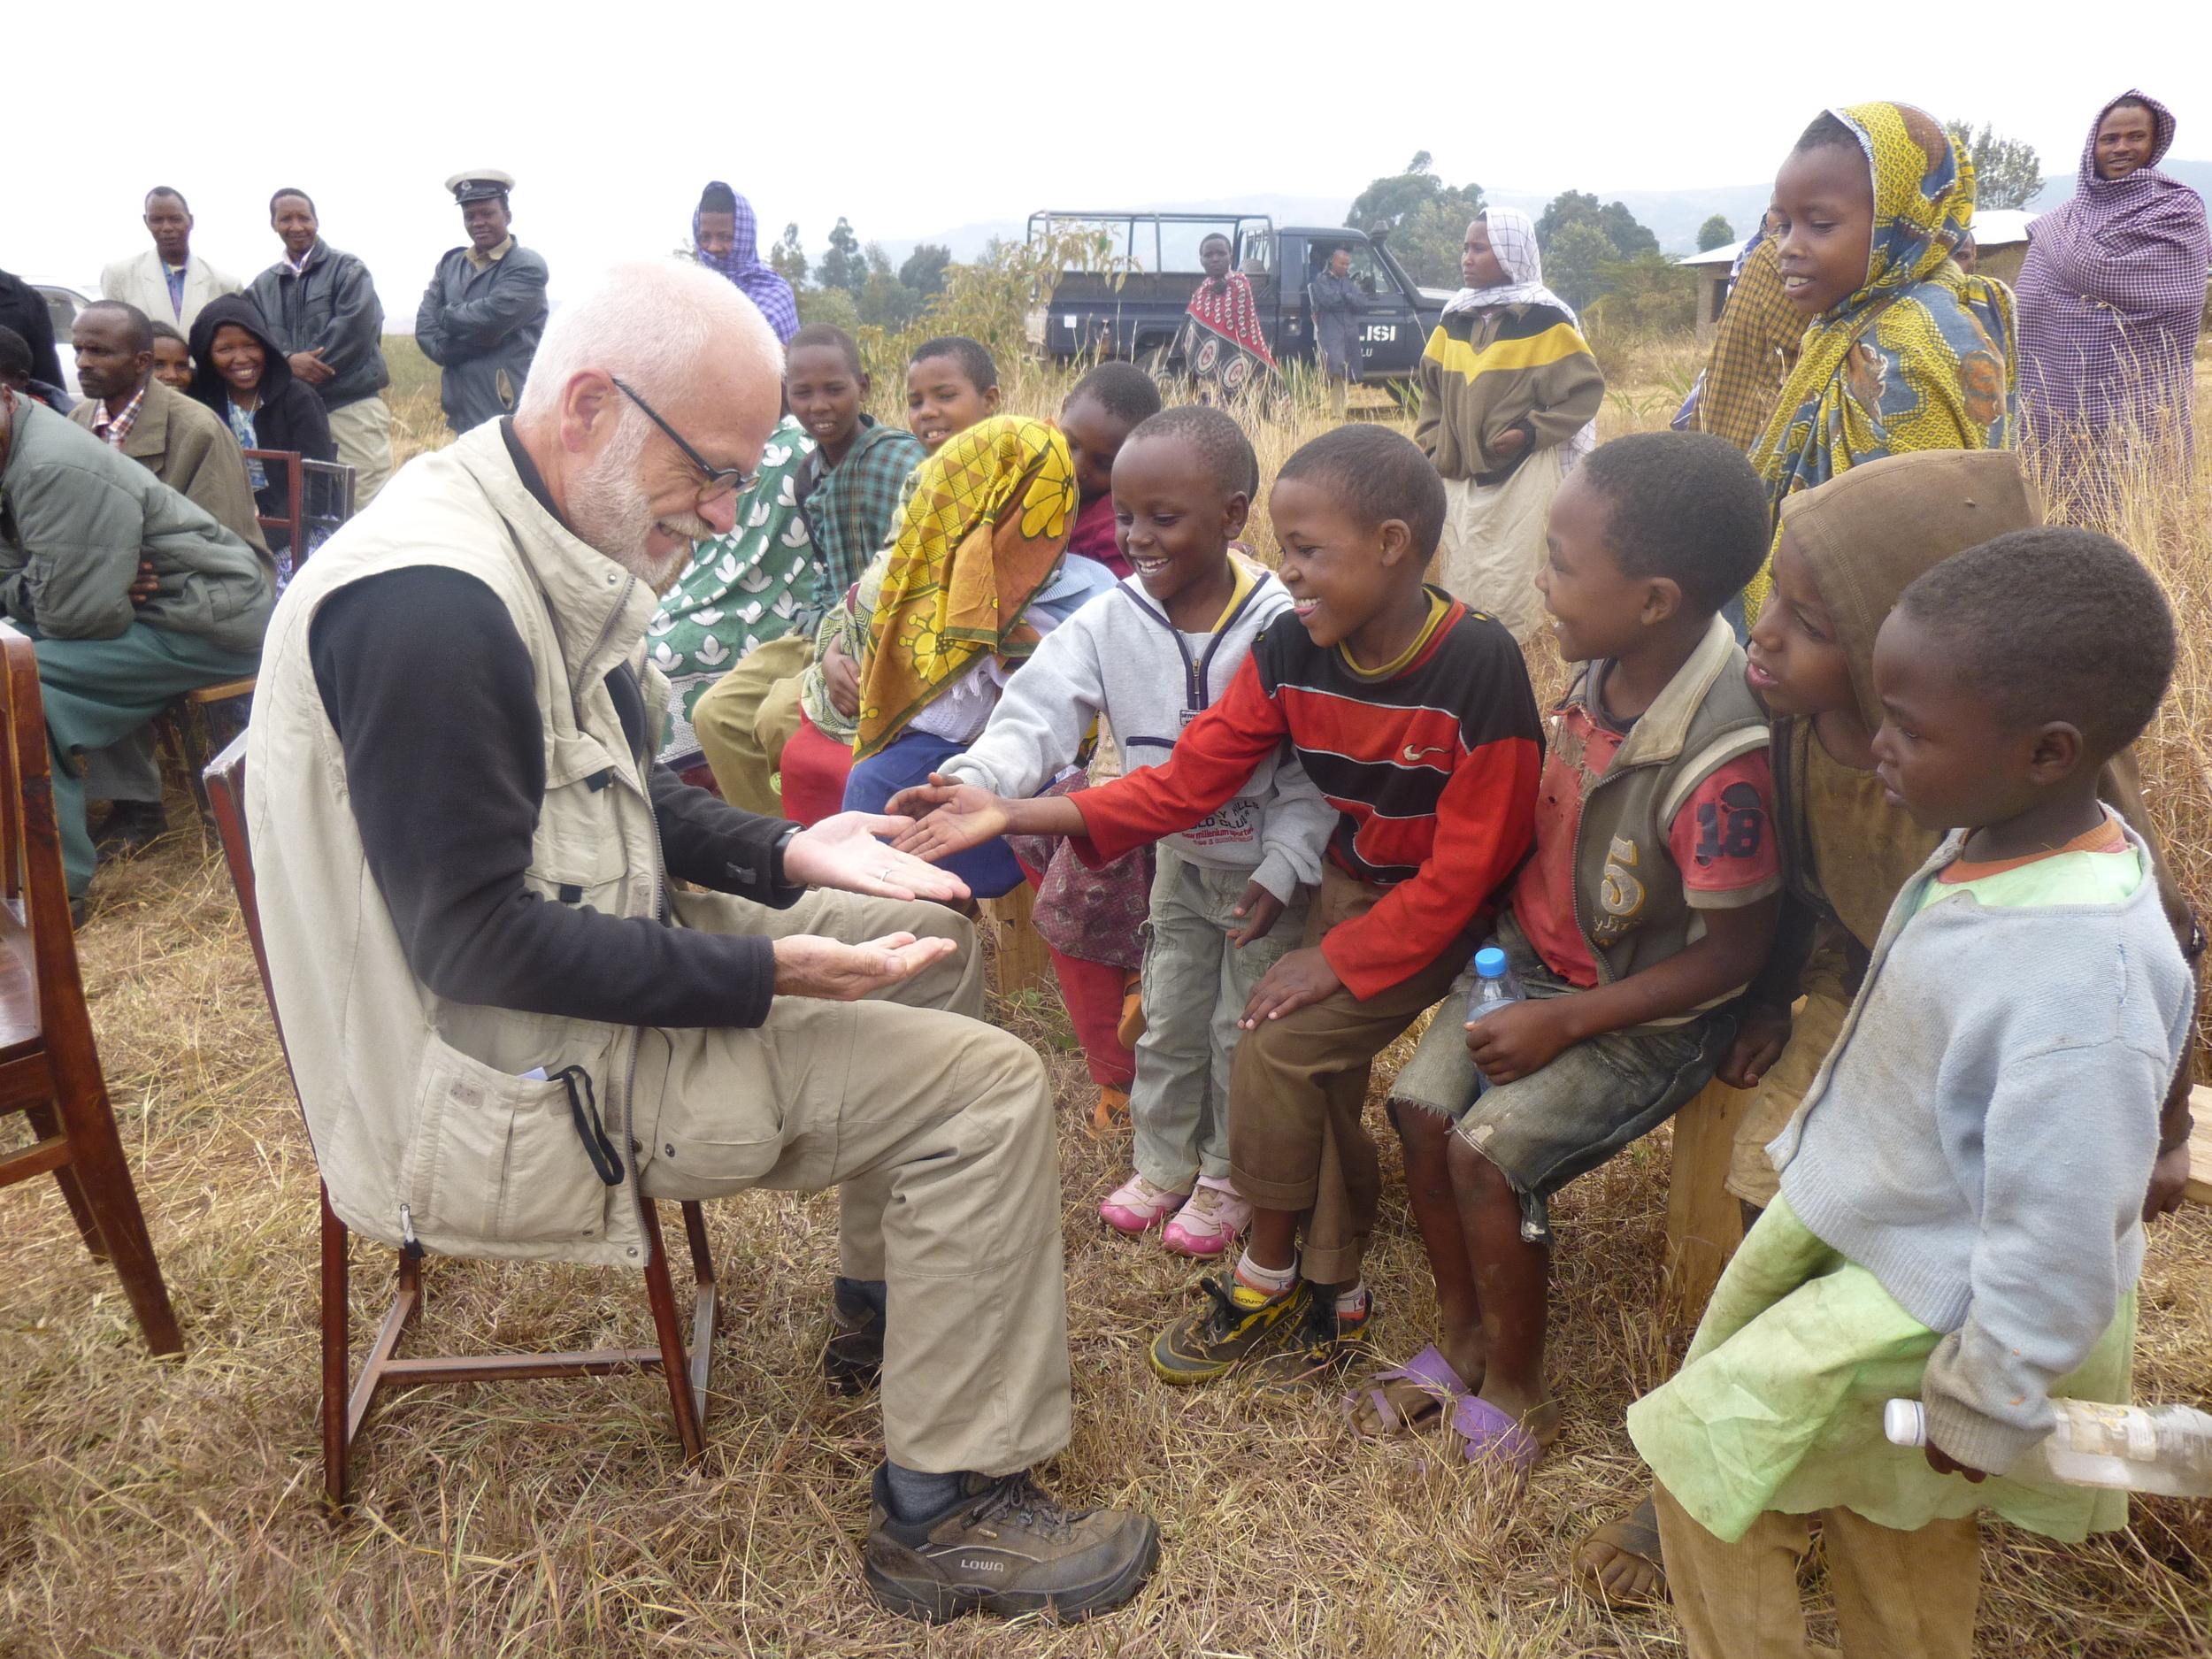 Empty hands! Med CARE i Tanzania September 2012